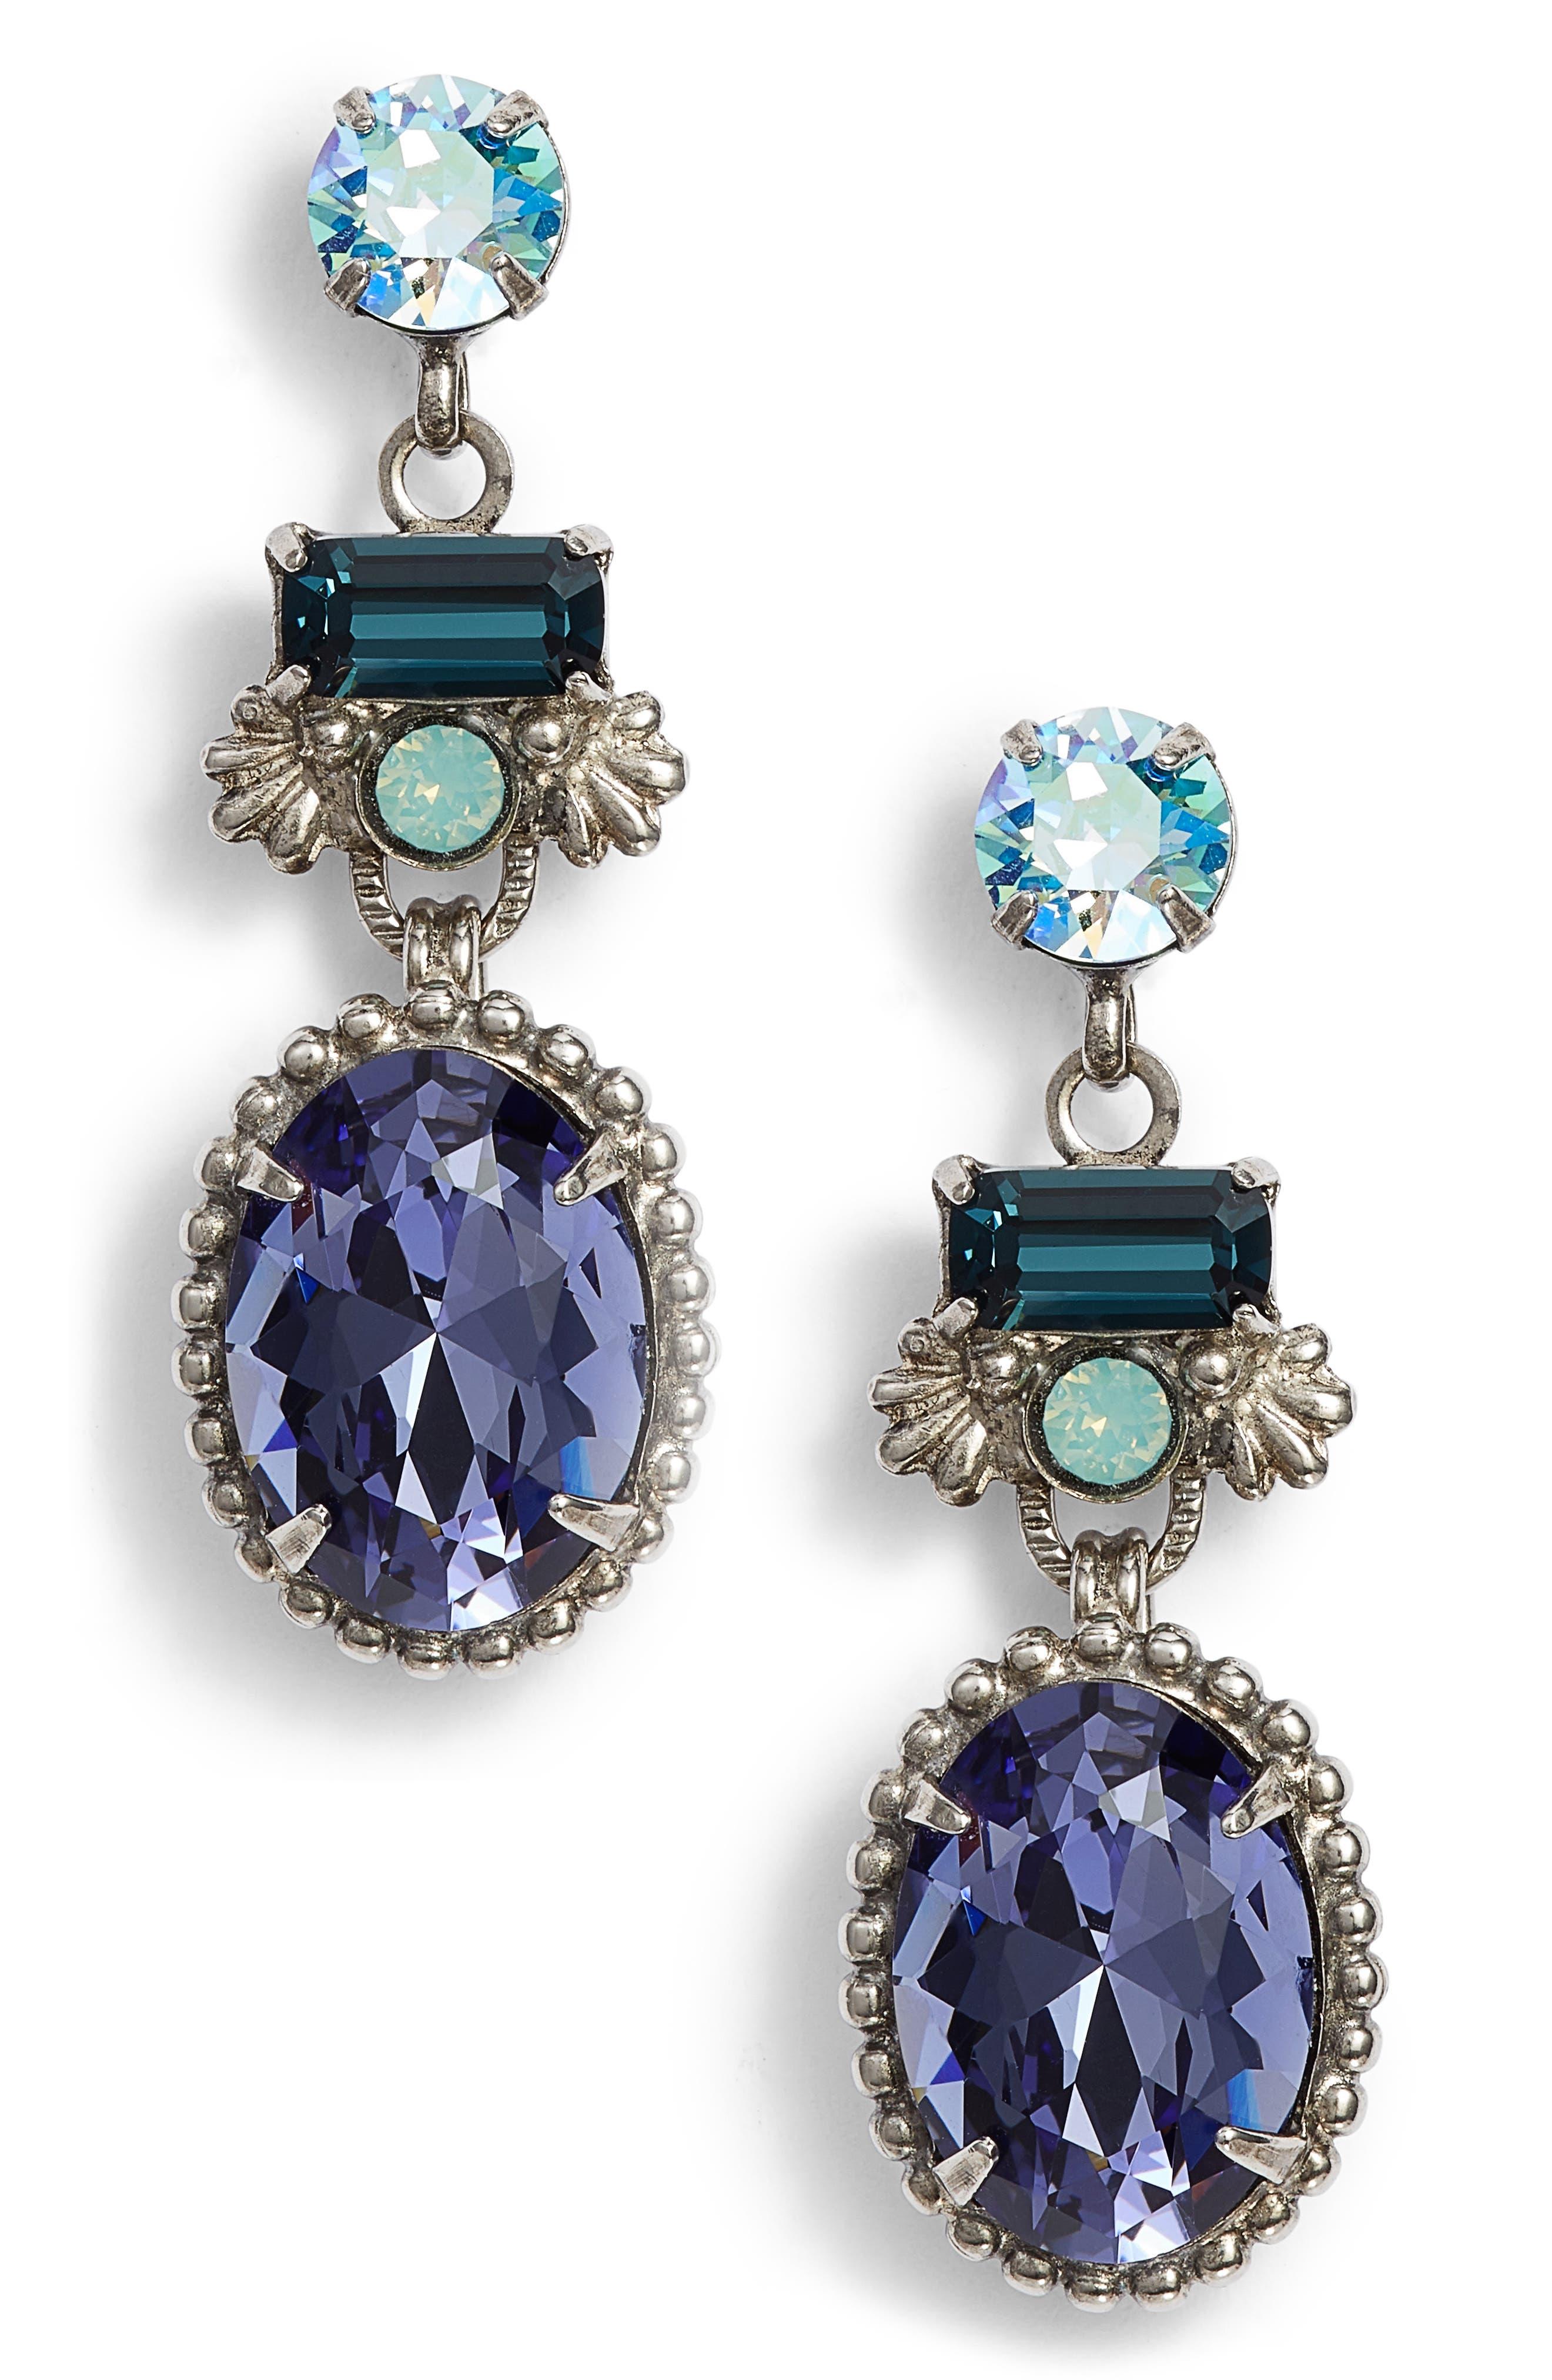 Bergenia Crystal Drop Earrings,                         Main,                         color, PURPLE/ BLUE